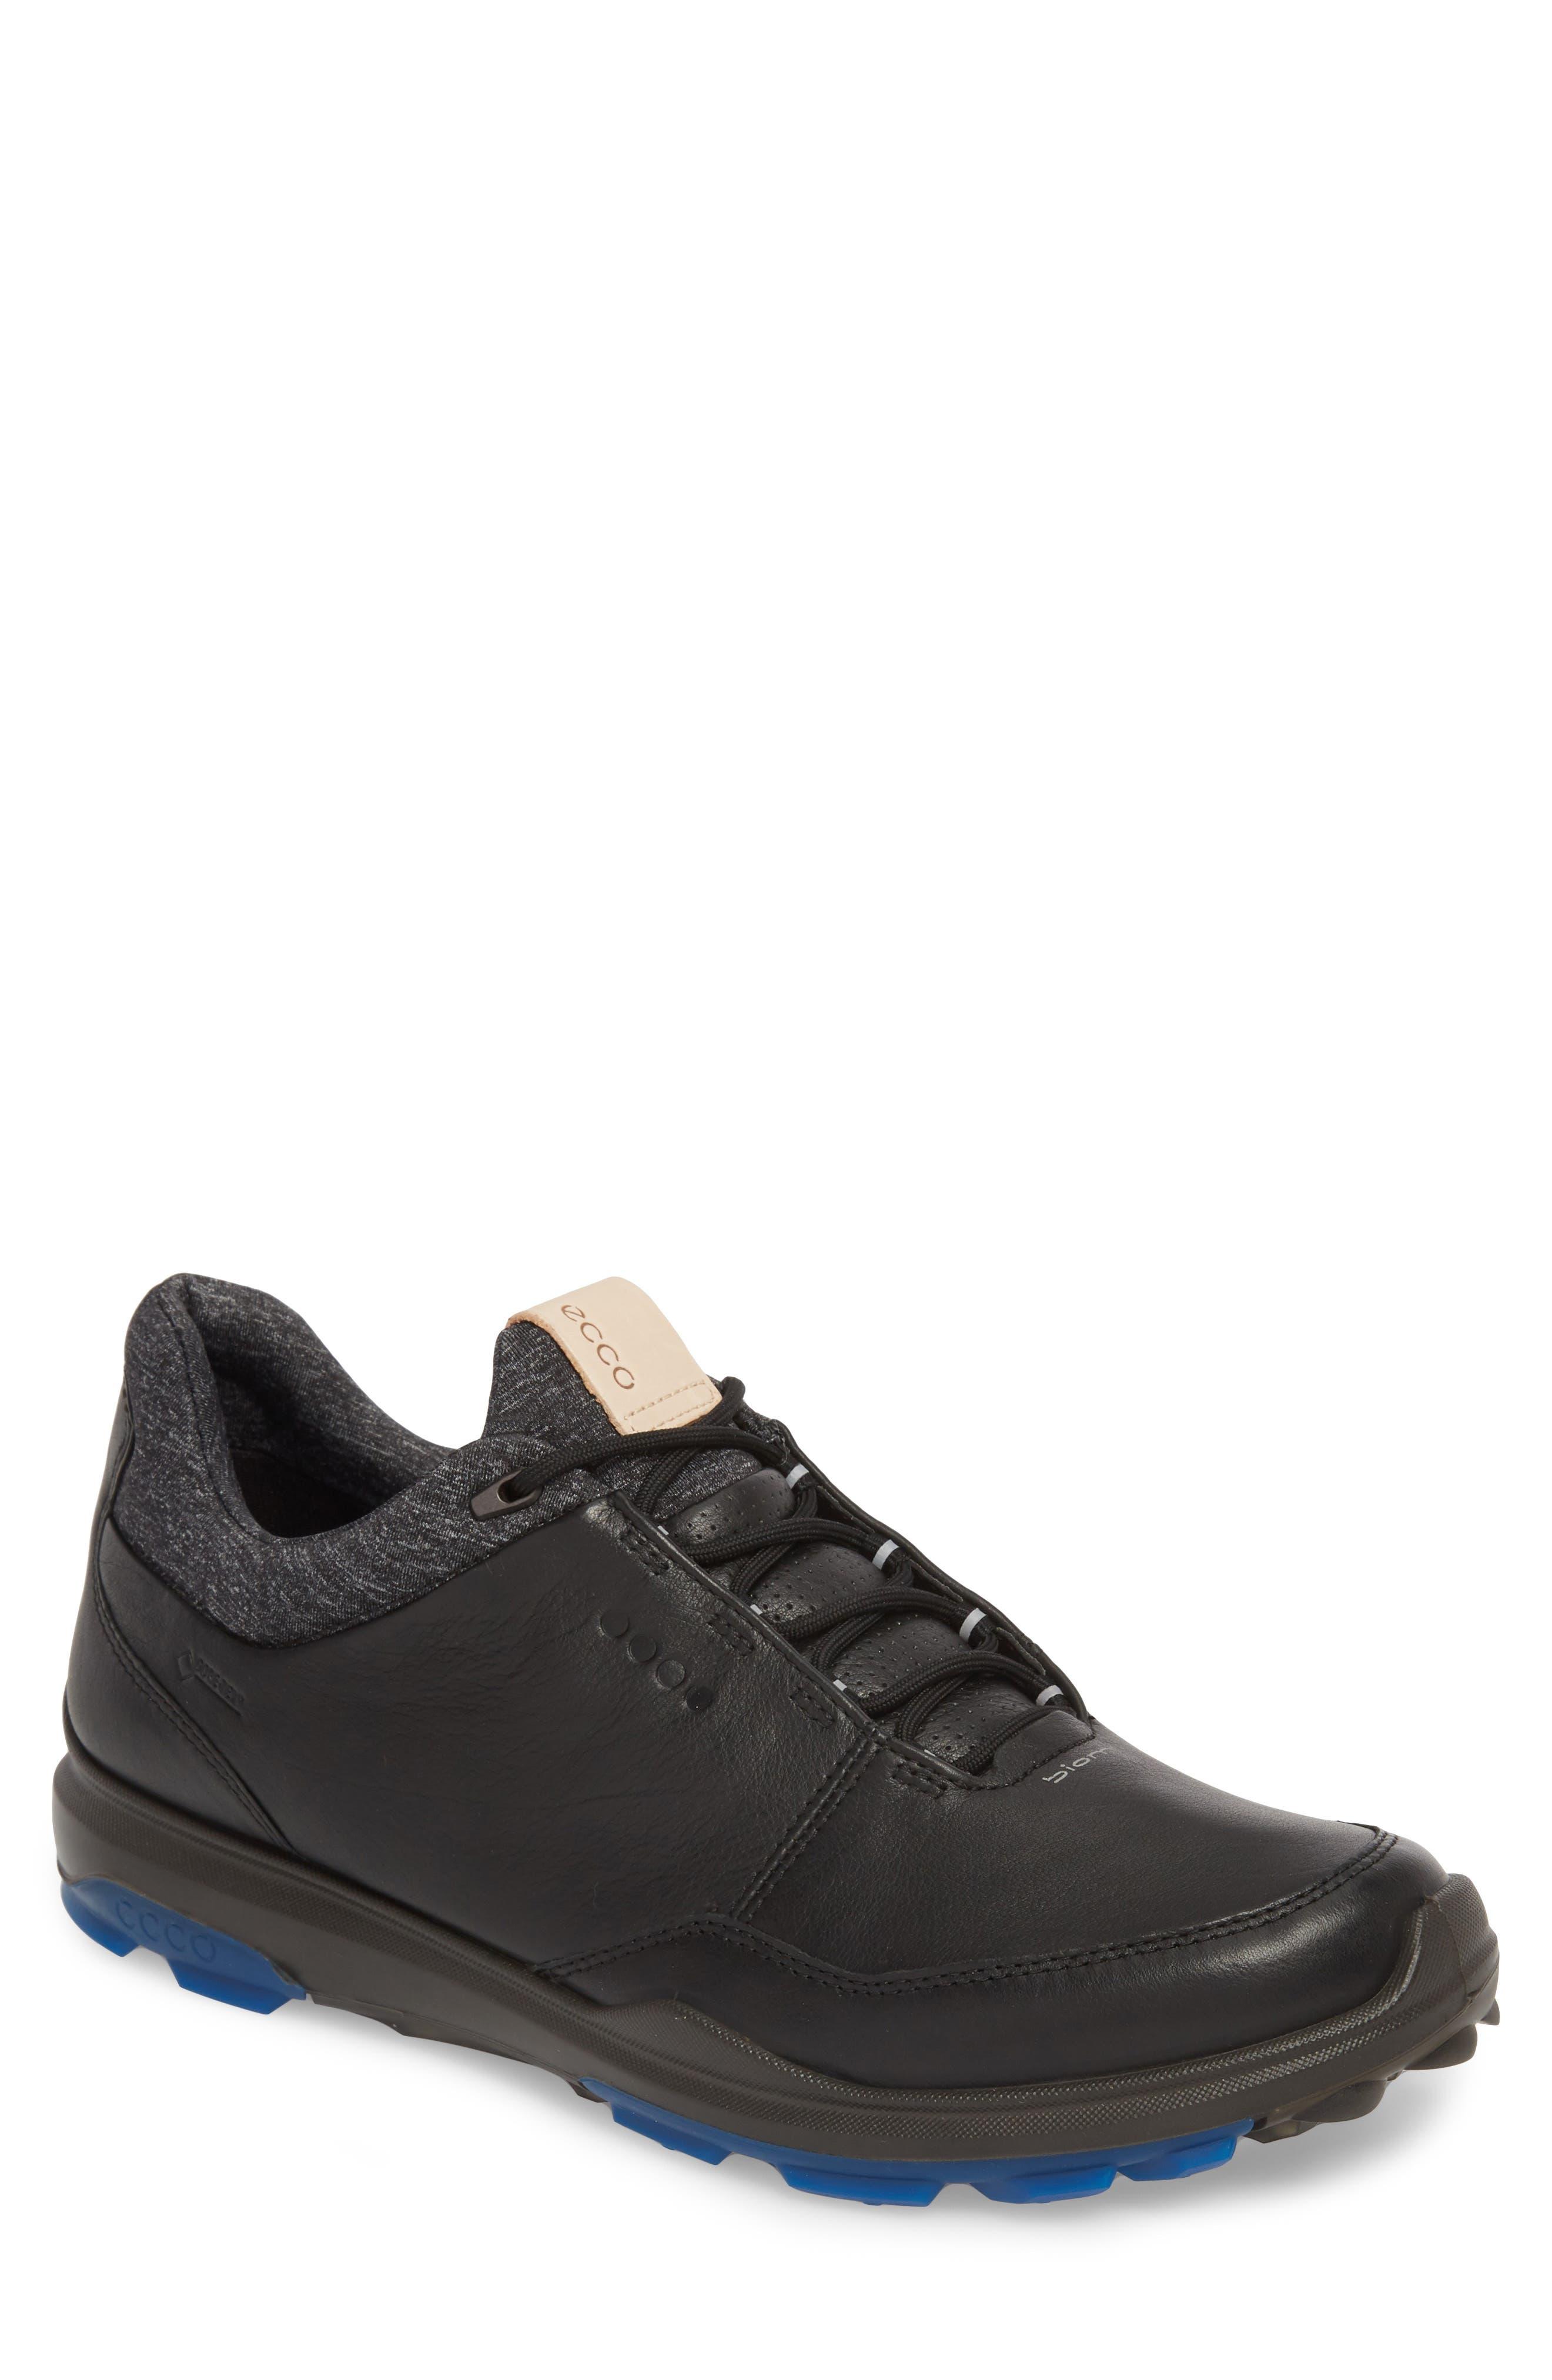 BIOM Hybrid 3 Gore-Tex<sup>®</sup> Golf Shoe,                         Main,                         color, Black/ Bermuda Blue Leather